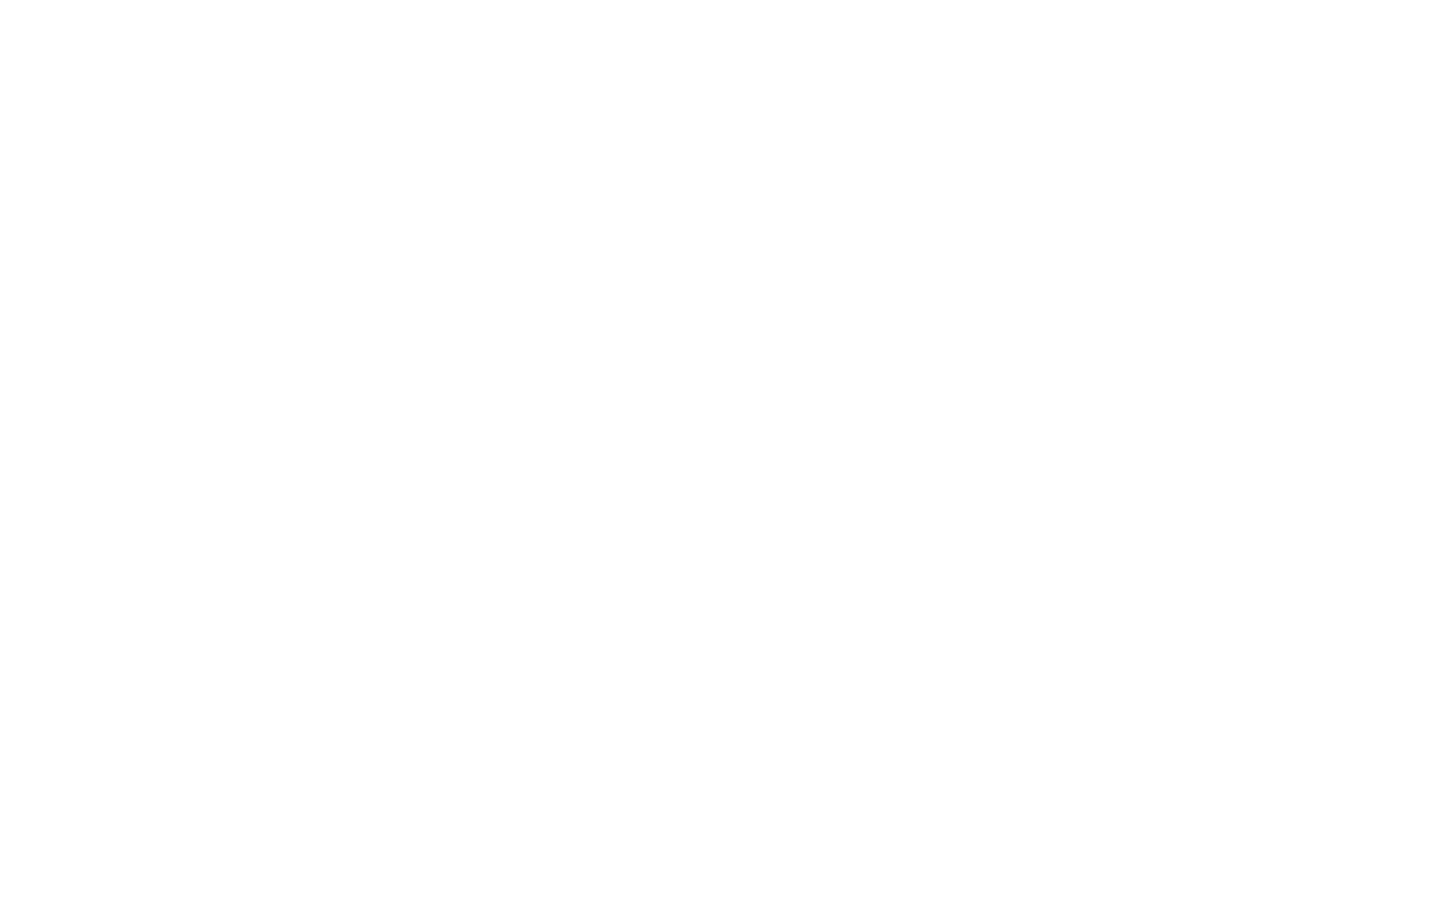 Alliance Specialty Pharmacy